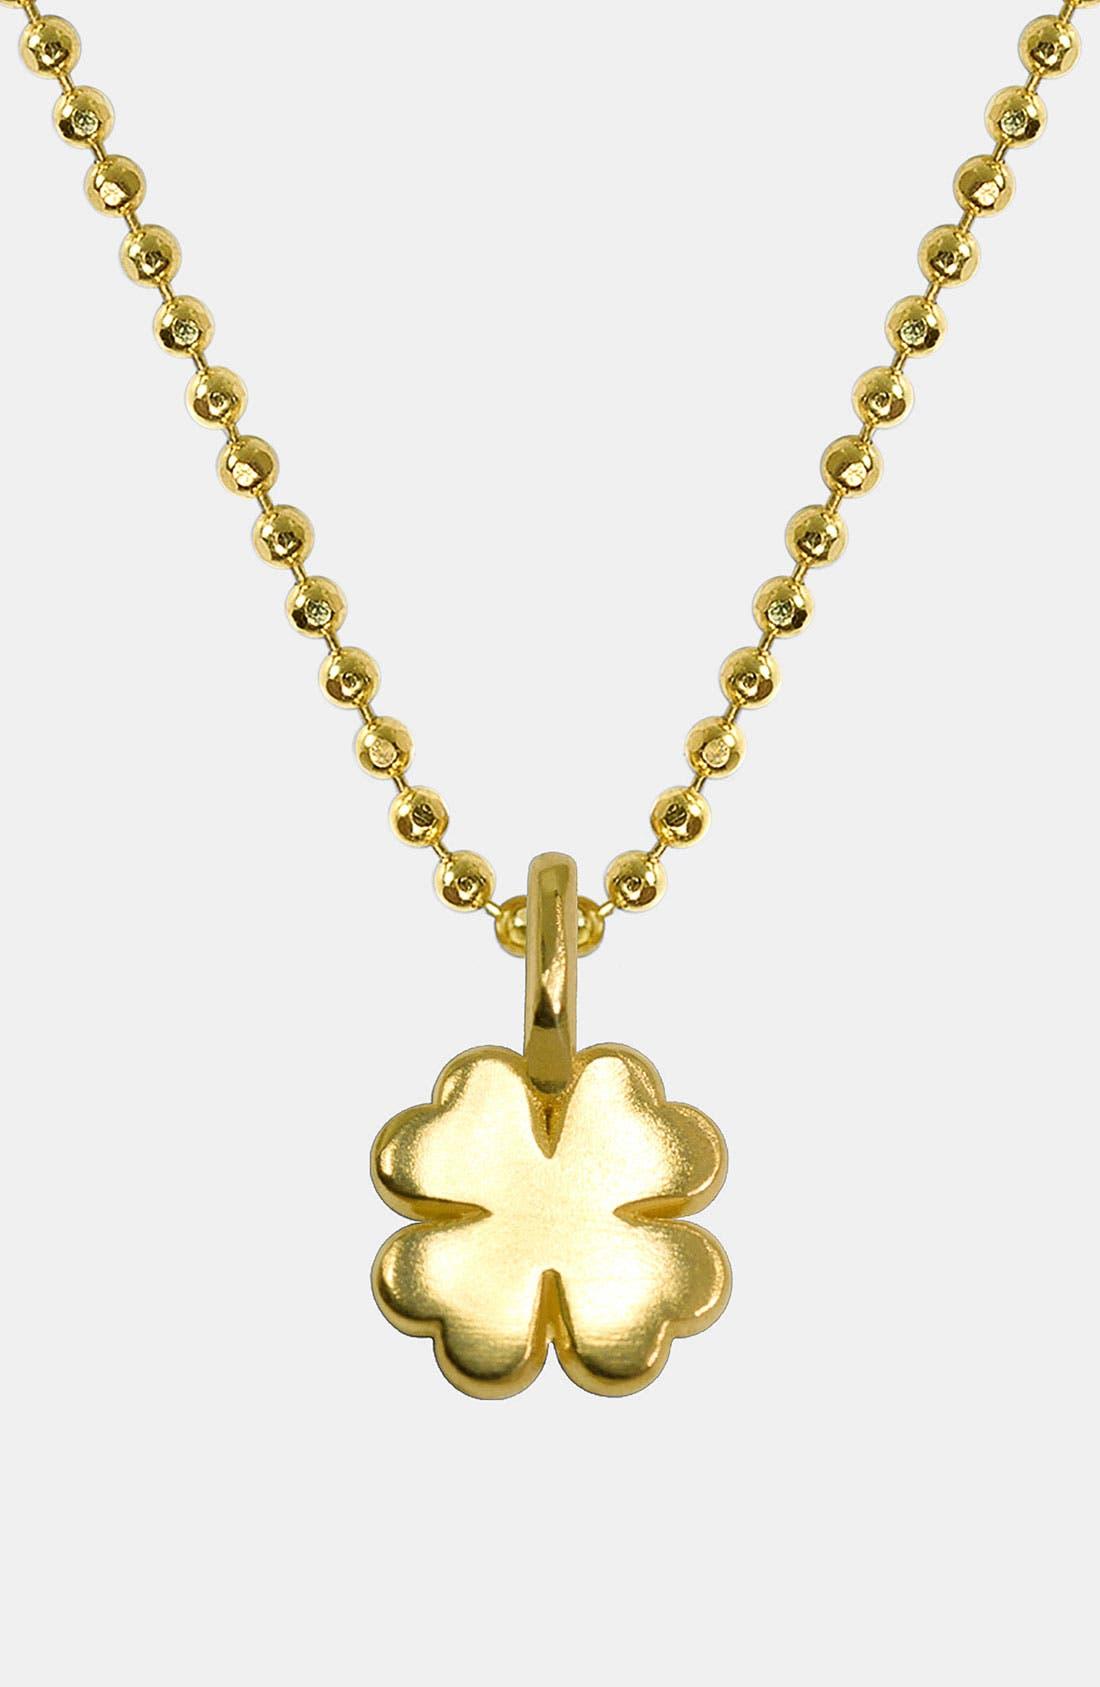 Main Image - Alex Woo 'Mini Clover' 14k Gold Pendant Necklace